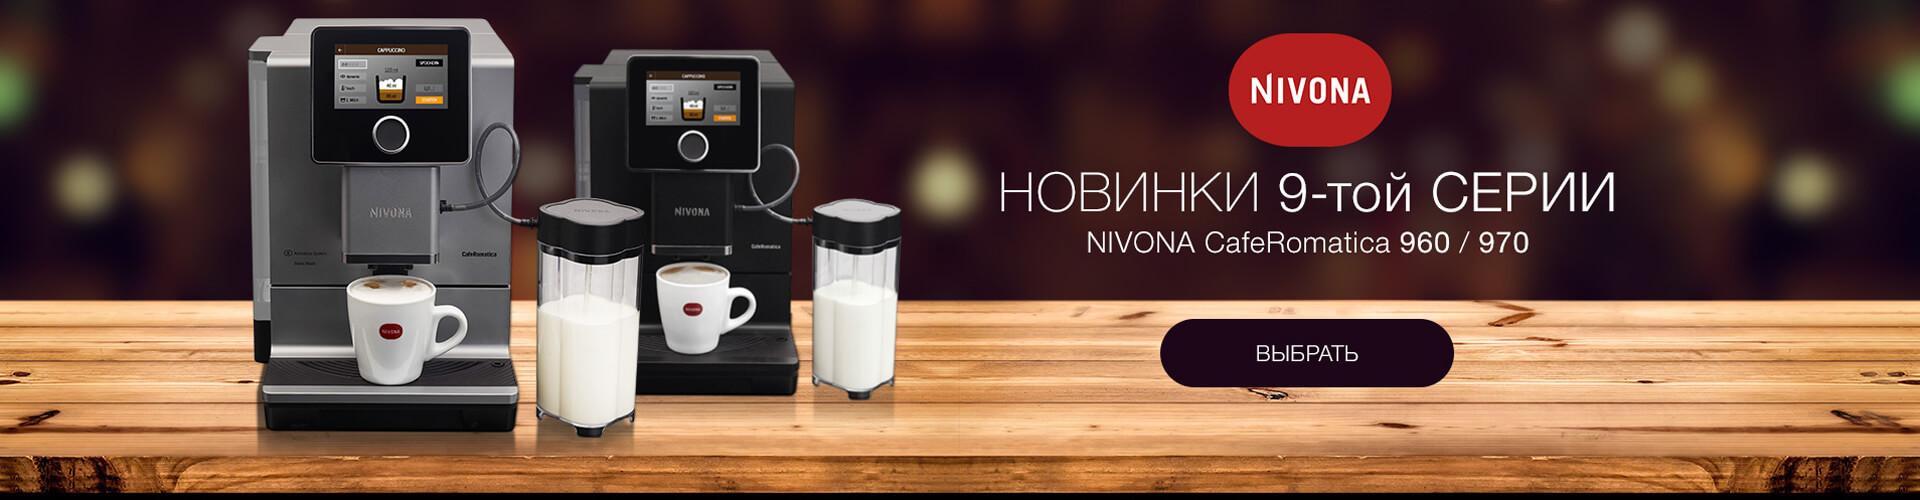 Nivona - 9 серия